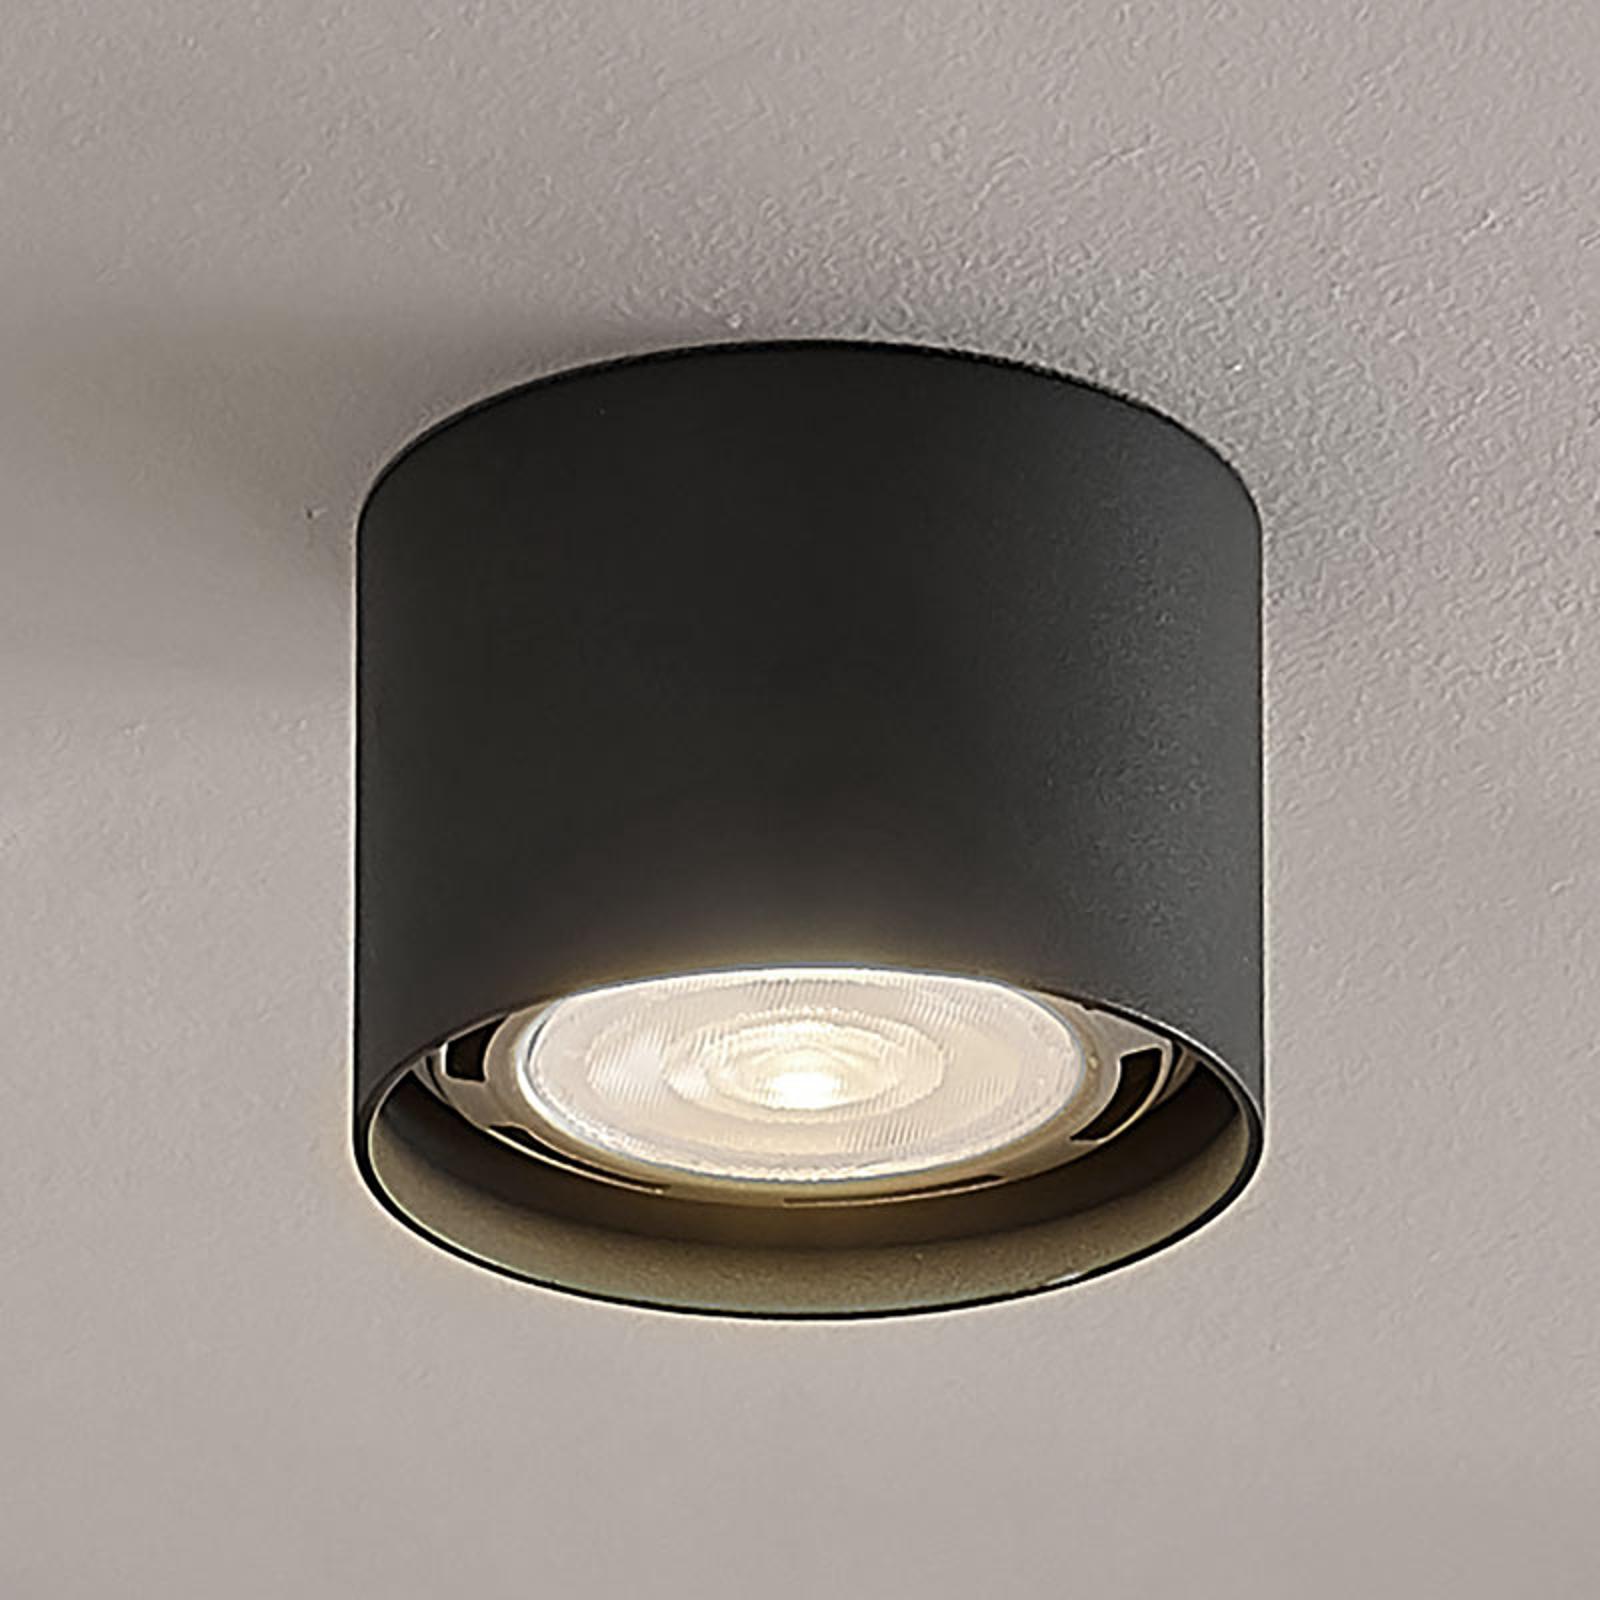 LED-Deckenstrahler Mabel, rund, dunkelgrau